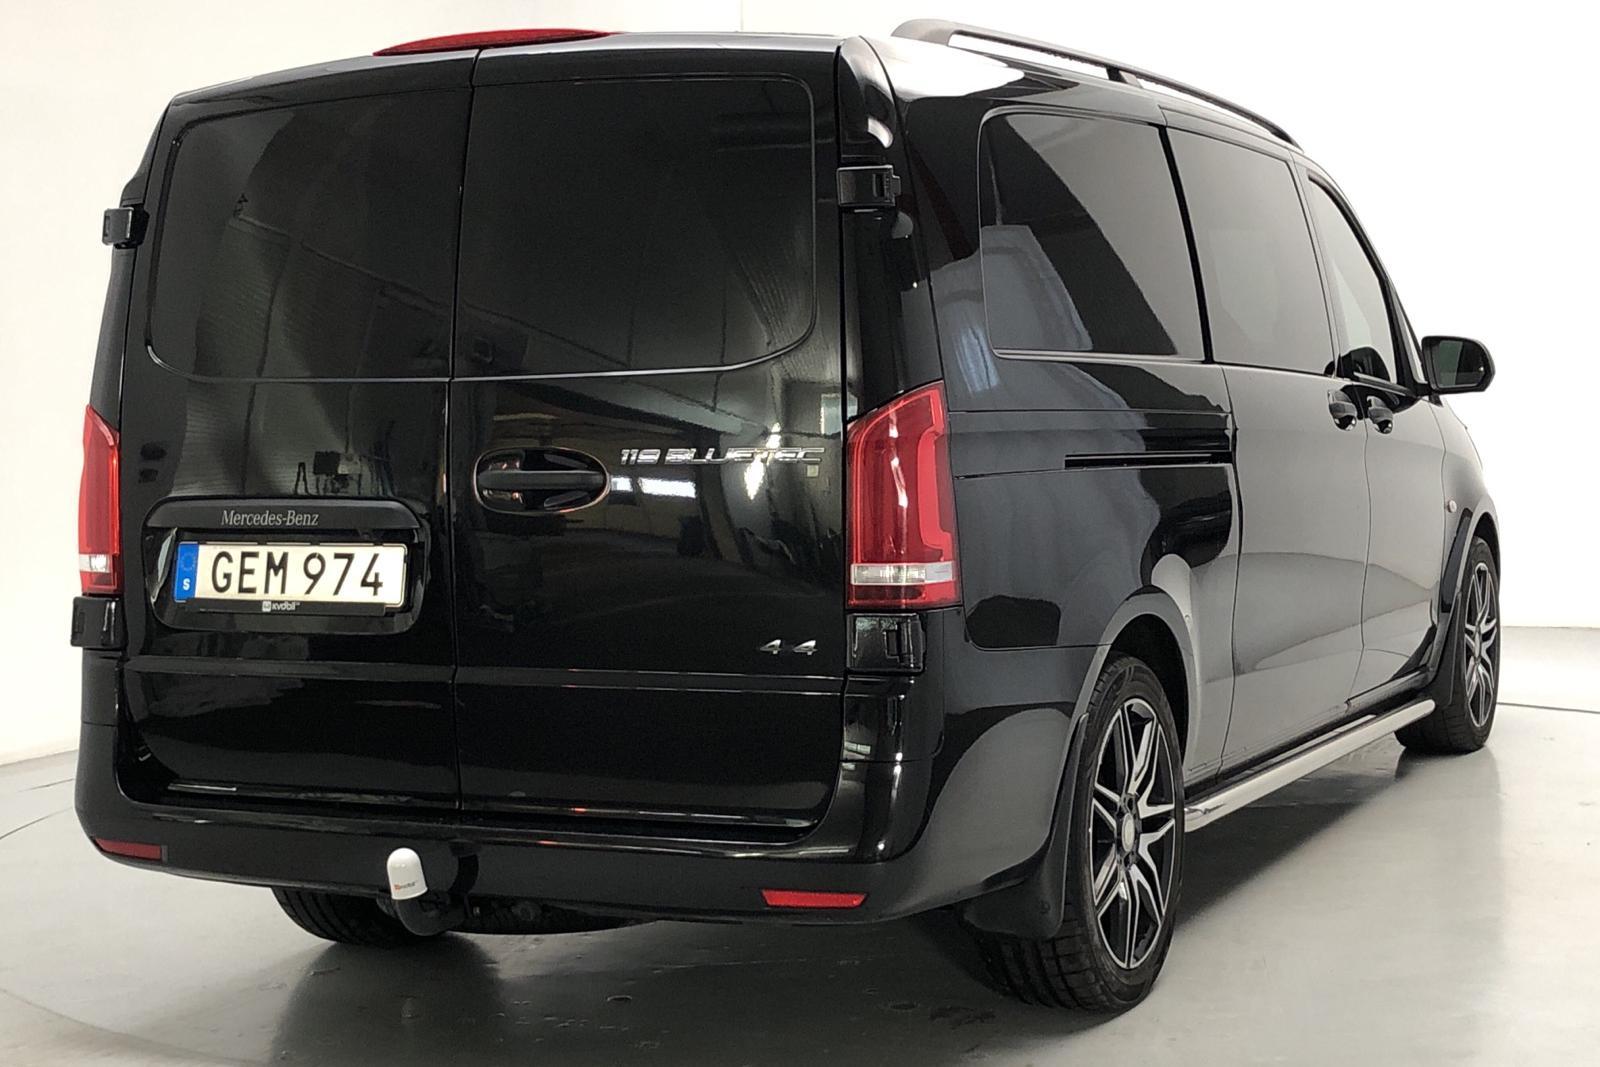 MB MERCEDES-BENZ - 110 000 km - Automatic - black - 2016